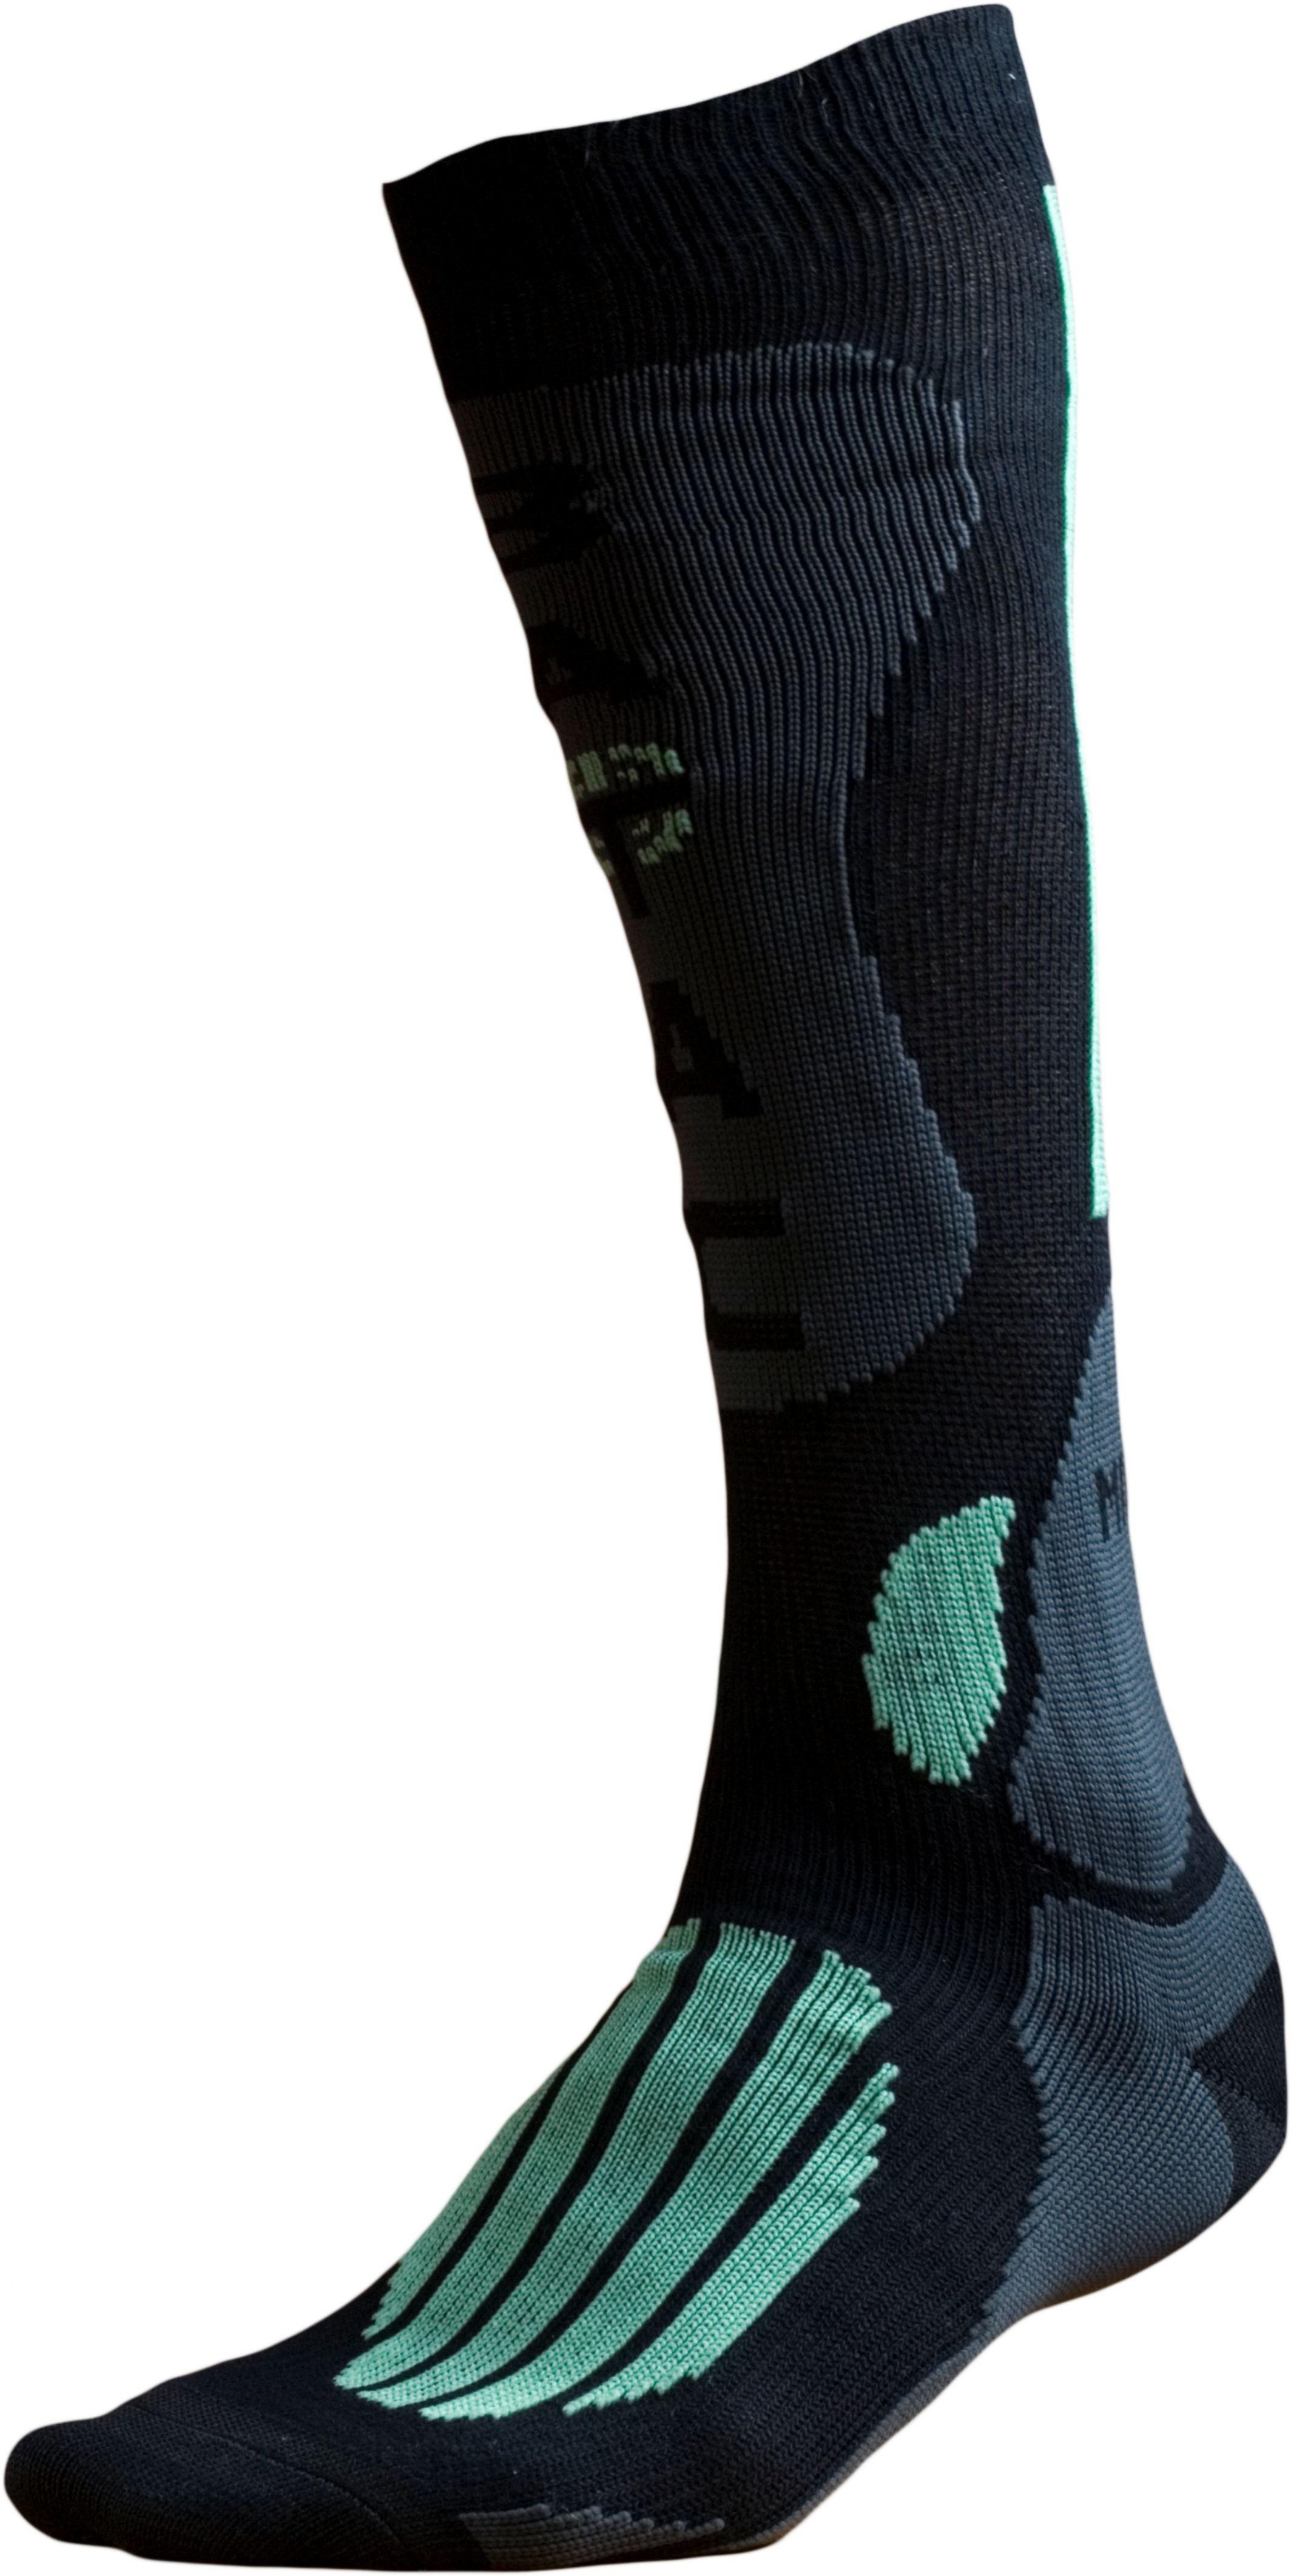 Ponožky BATAC Mission MI01 vel. 36-38 - black/green